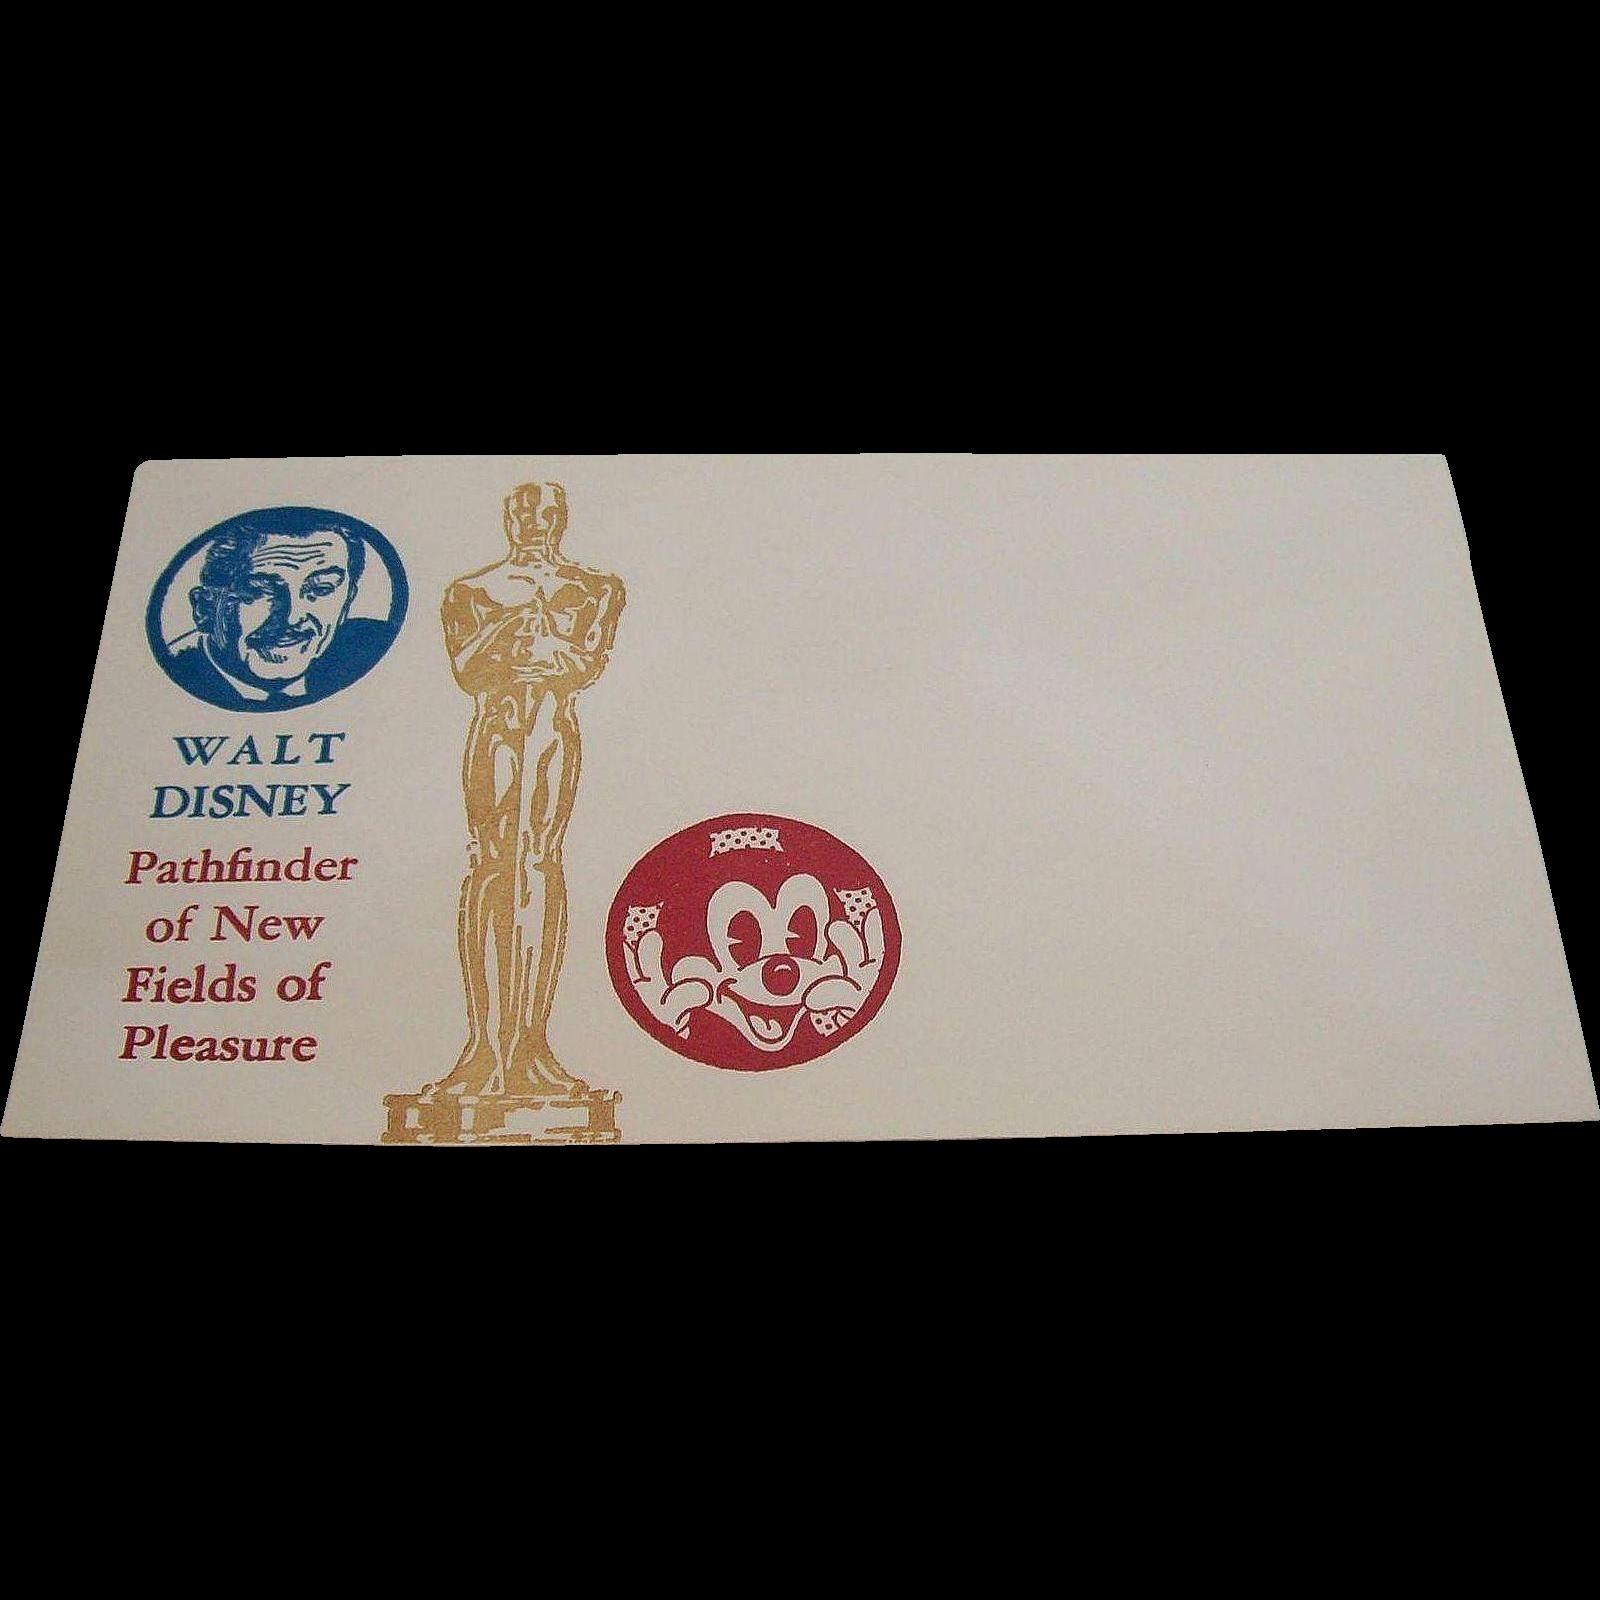 Walt Disney Pathfinder of New Fields of Pleasure Commemorative Envelope 1966